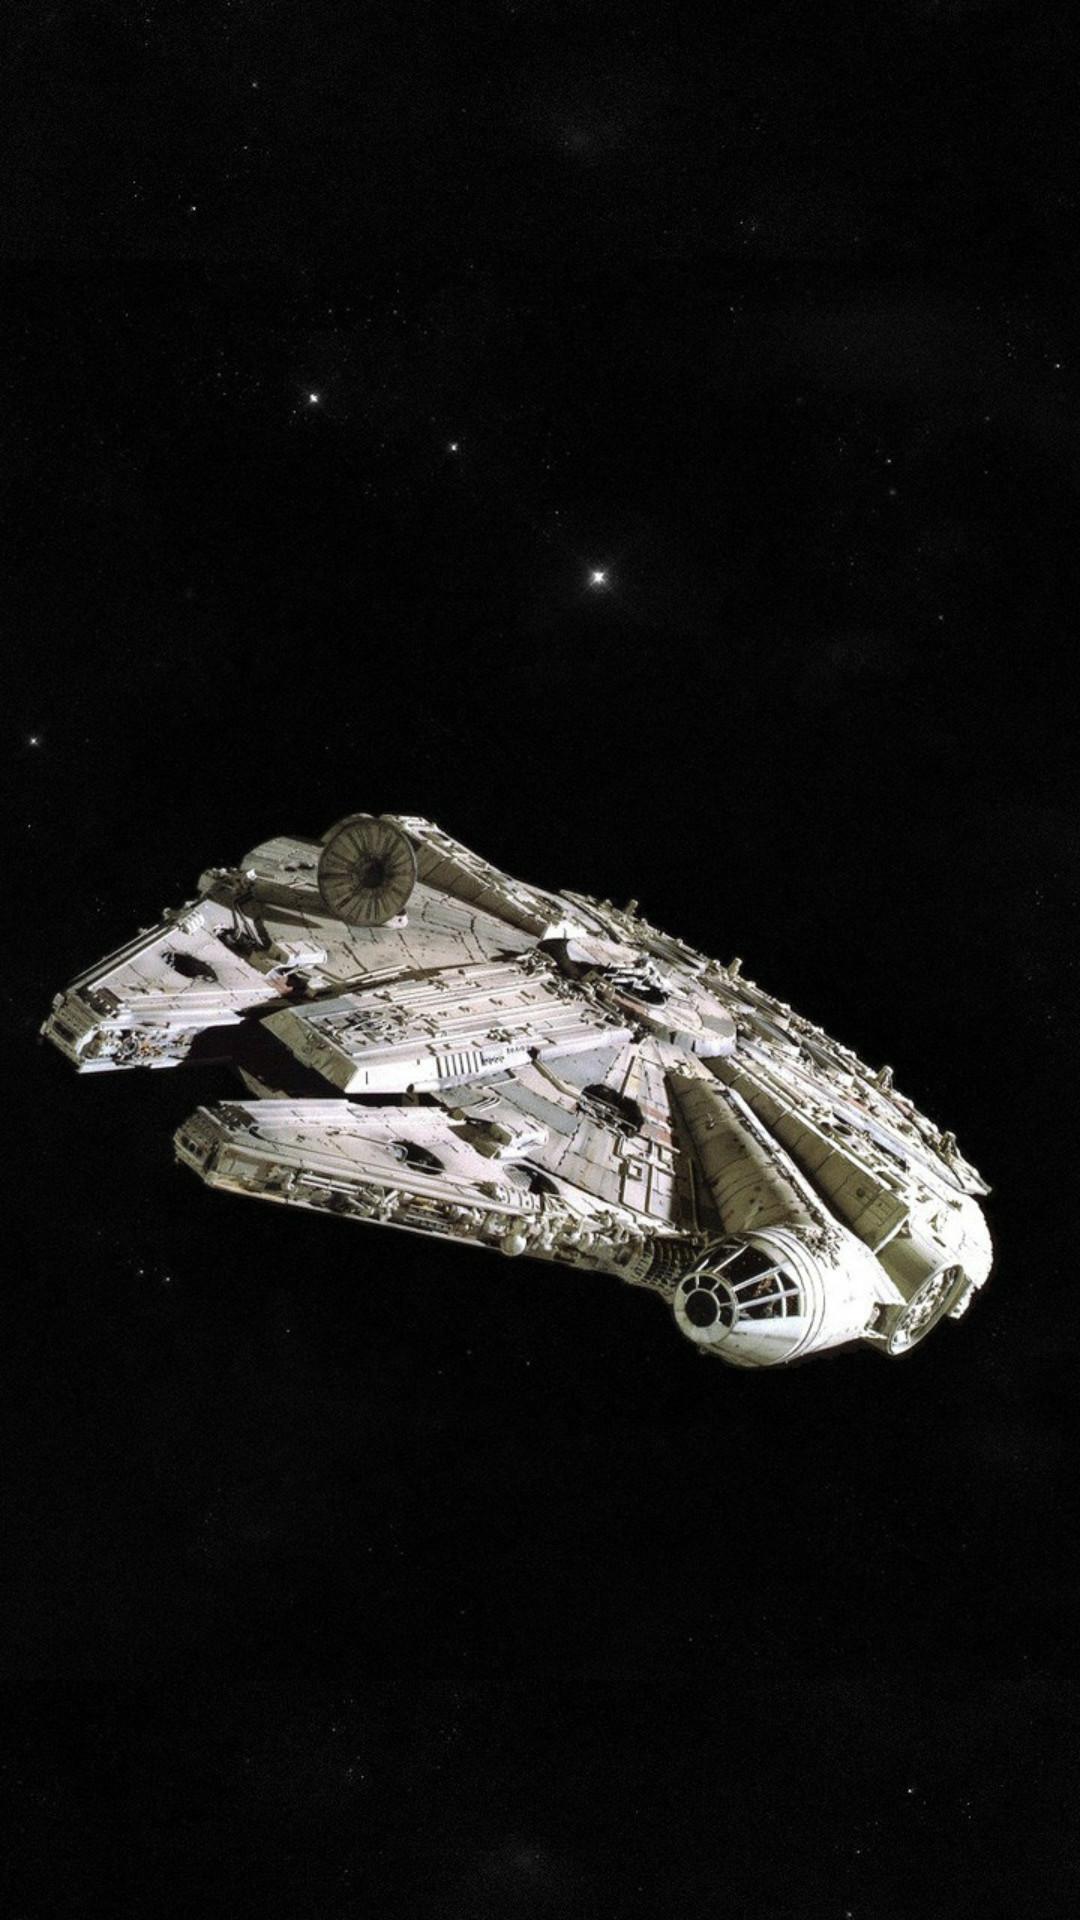 Millennium Falcon Spaceship Star Wars Mobile Wallpaper Millennium Falcon Wallpaper Mobile 1080x1920 Wallpaper Teahub Io